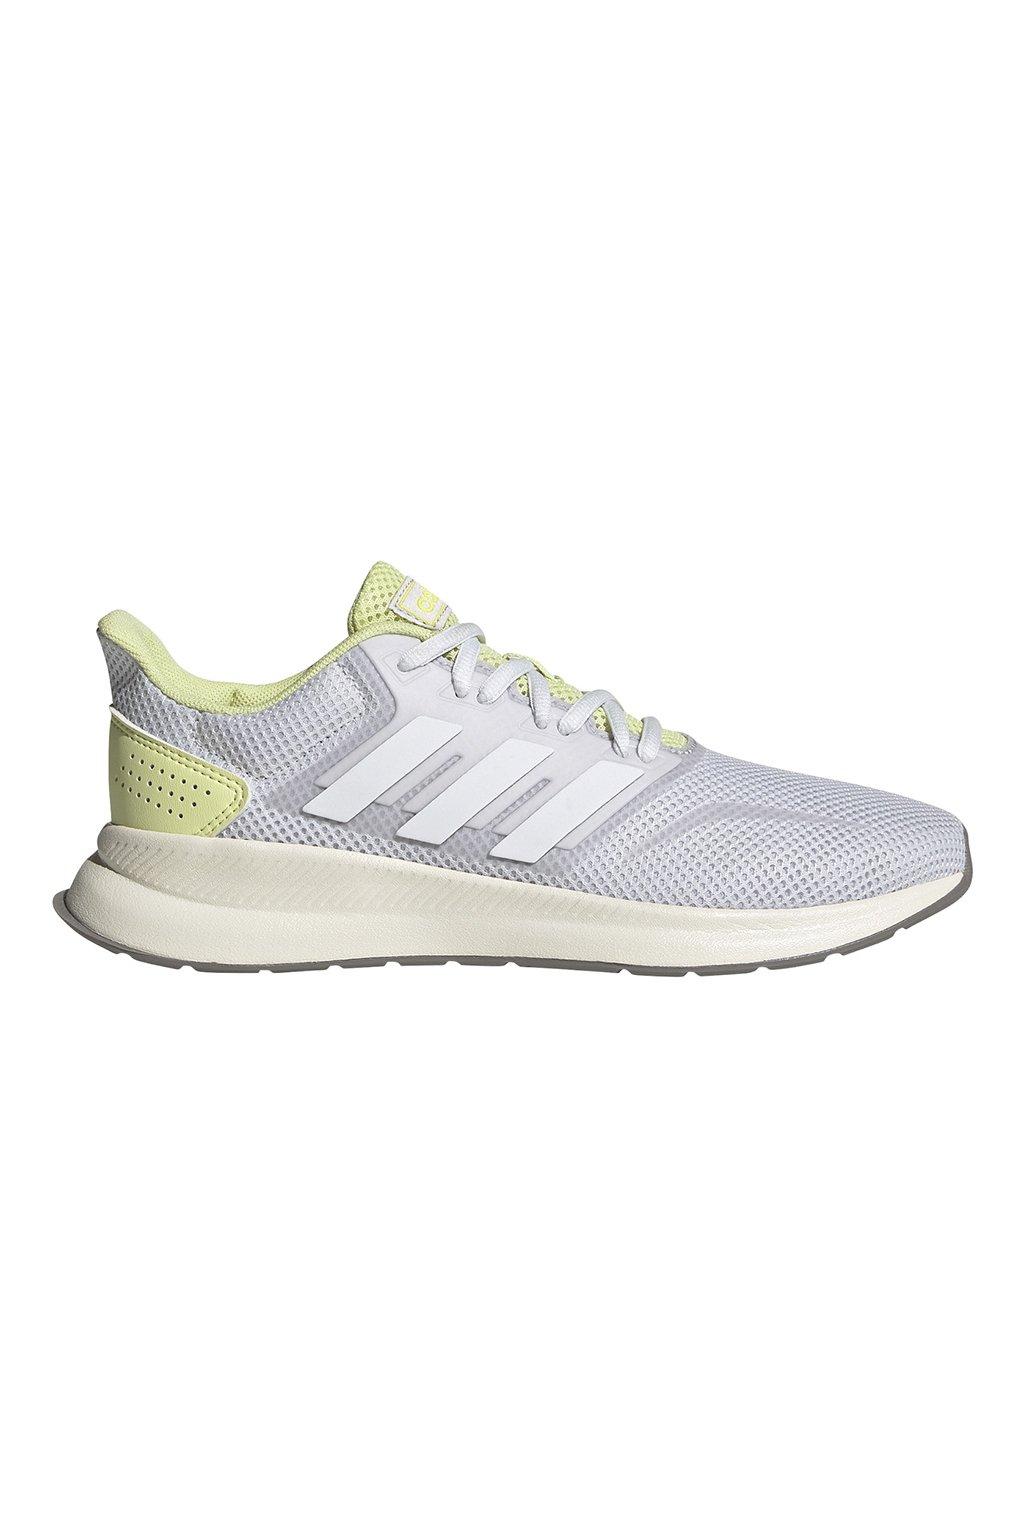 Dámske tenisky Adidas Runfalcon šedo-žlté EG8622